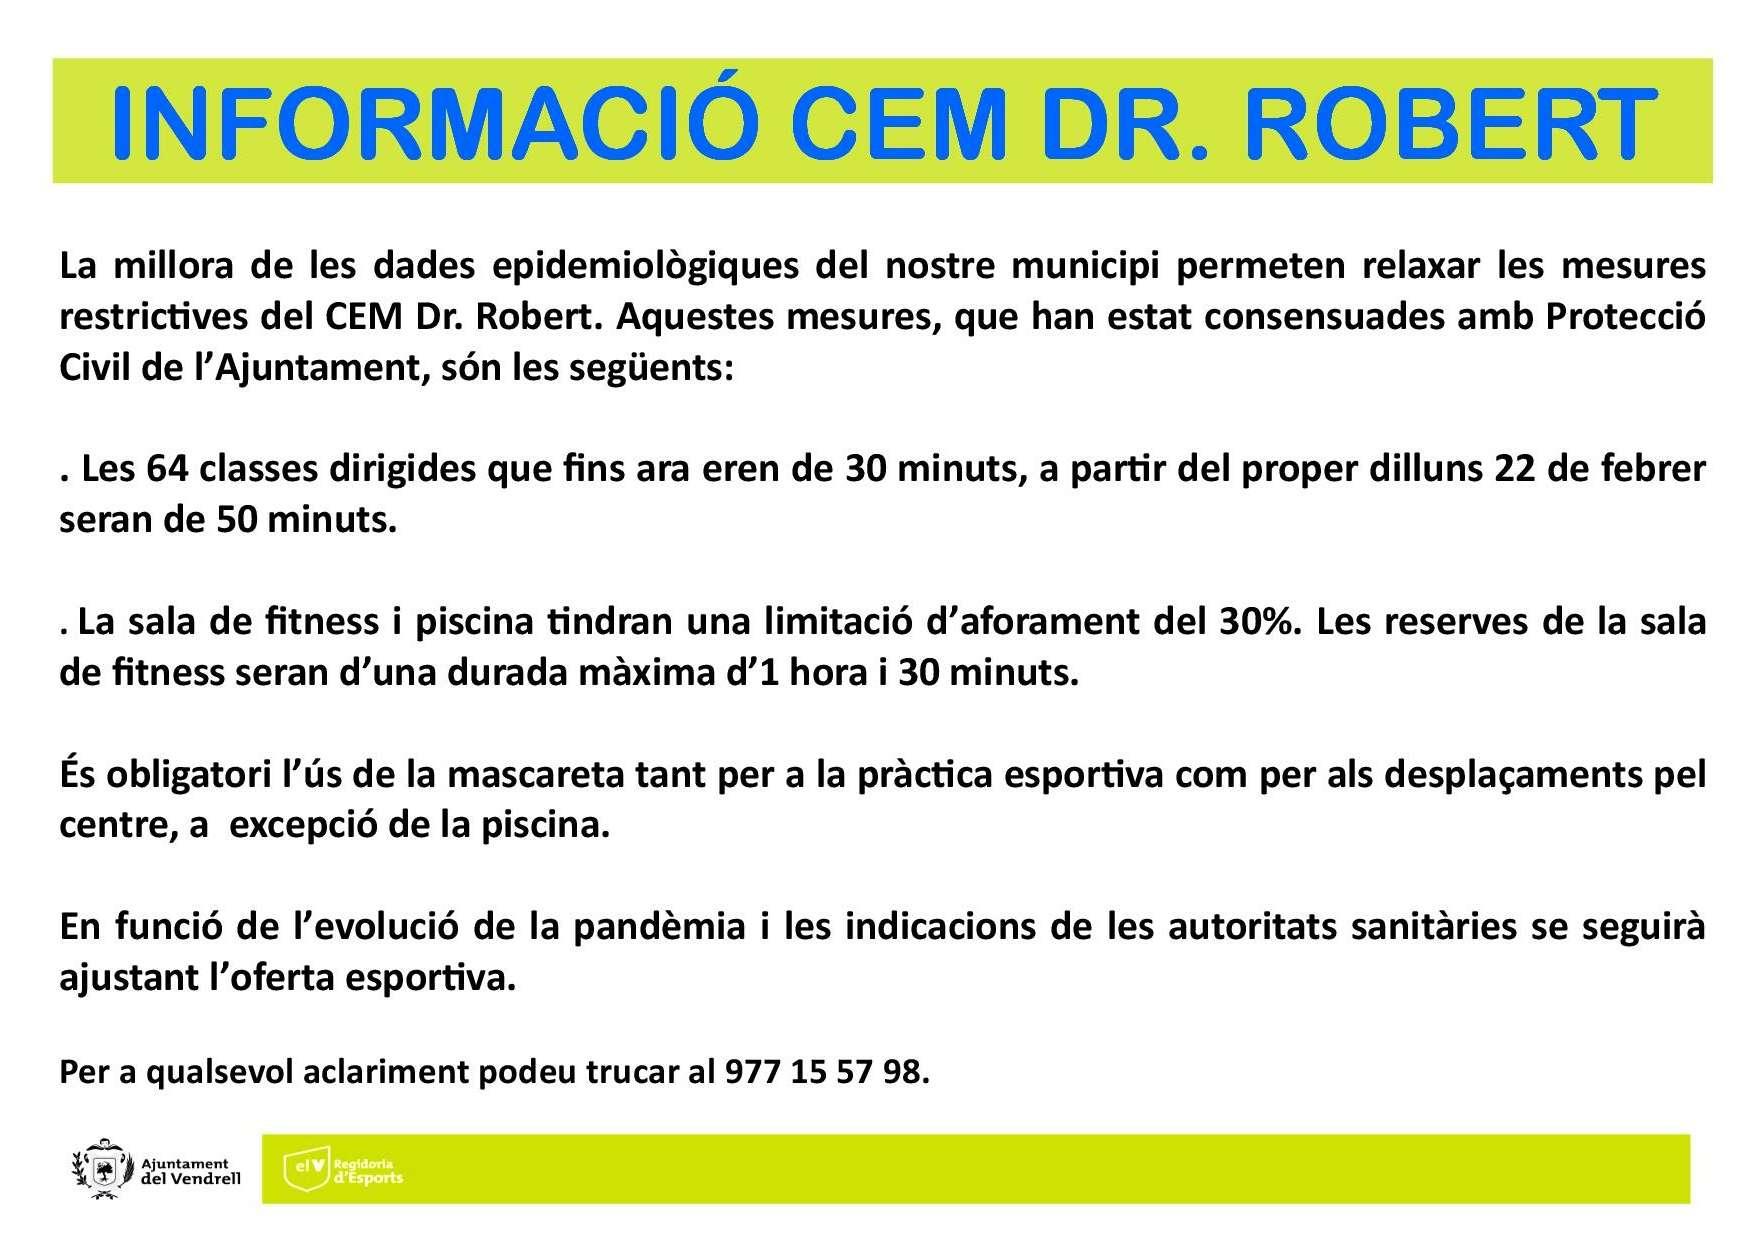 INFORMACIÓ CEM DR. ROBERT 22 FEBRER